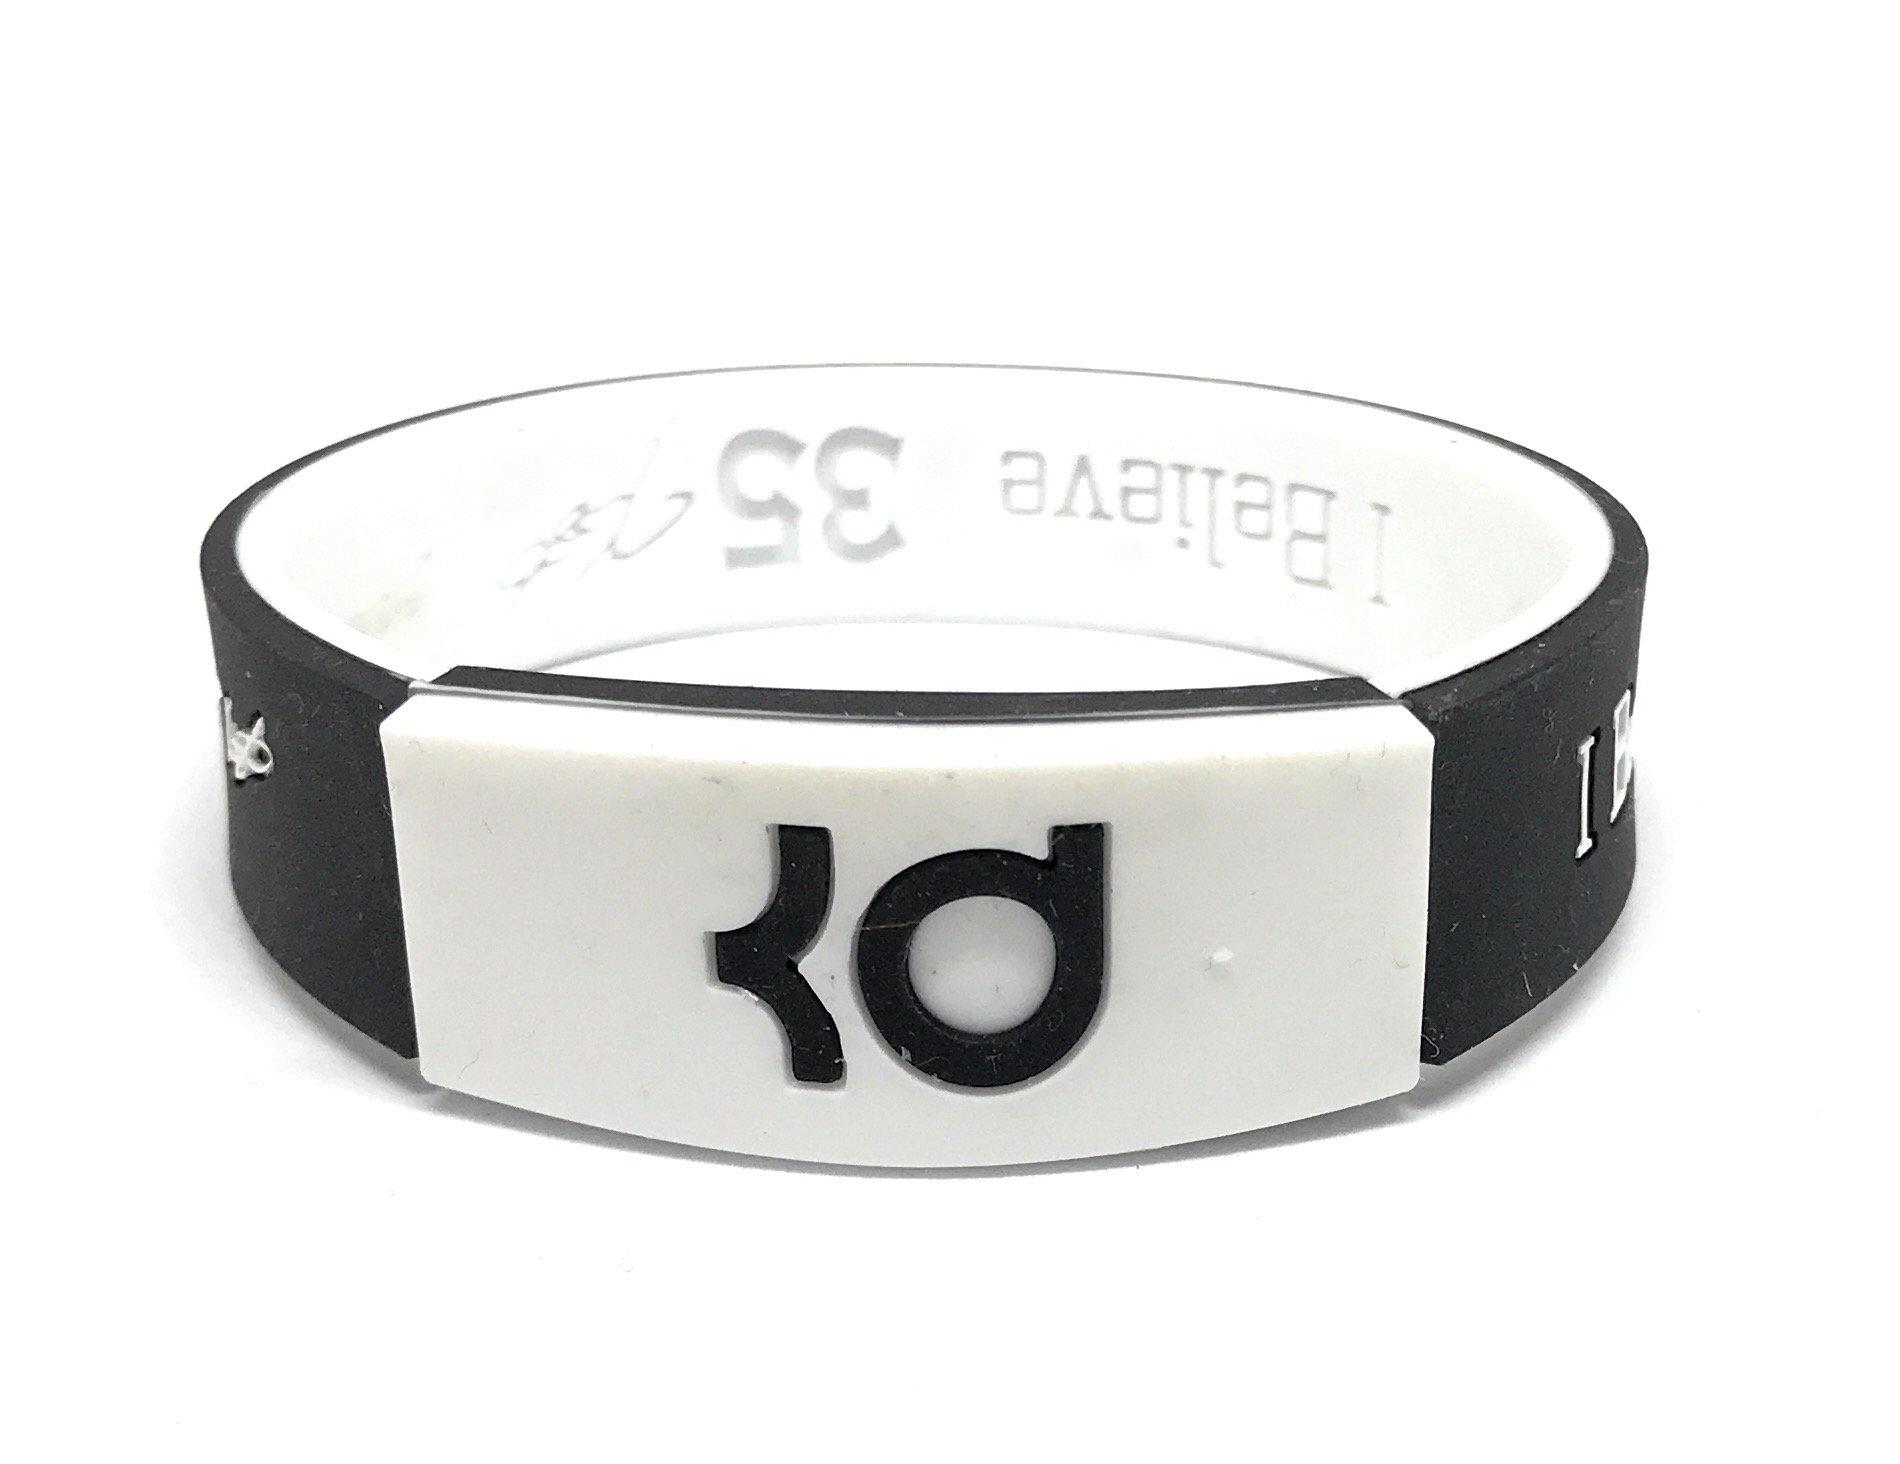 SportsBraceletsPro KIDS REVERSIBLE Wristband SIZE 6.7'' Bracelet (Durant KIDS 6.7'' Black/White)